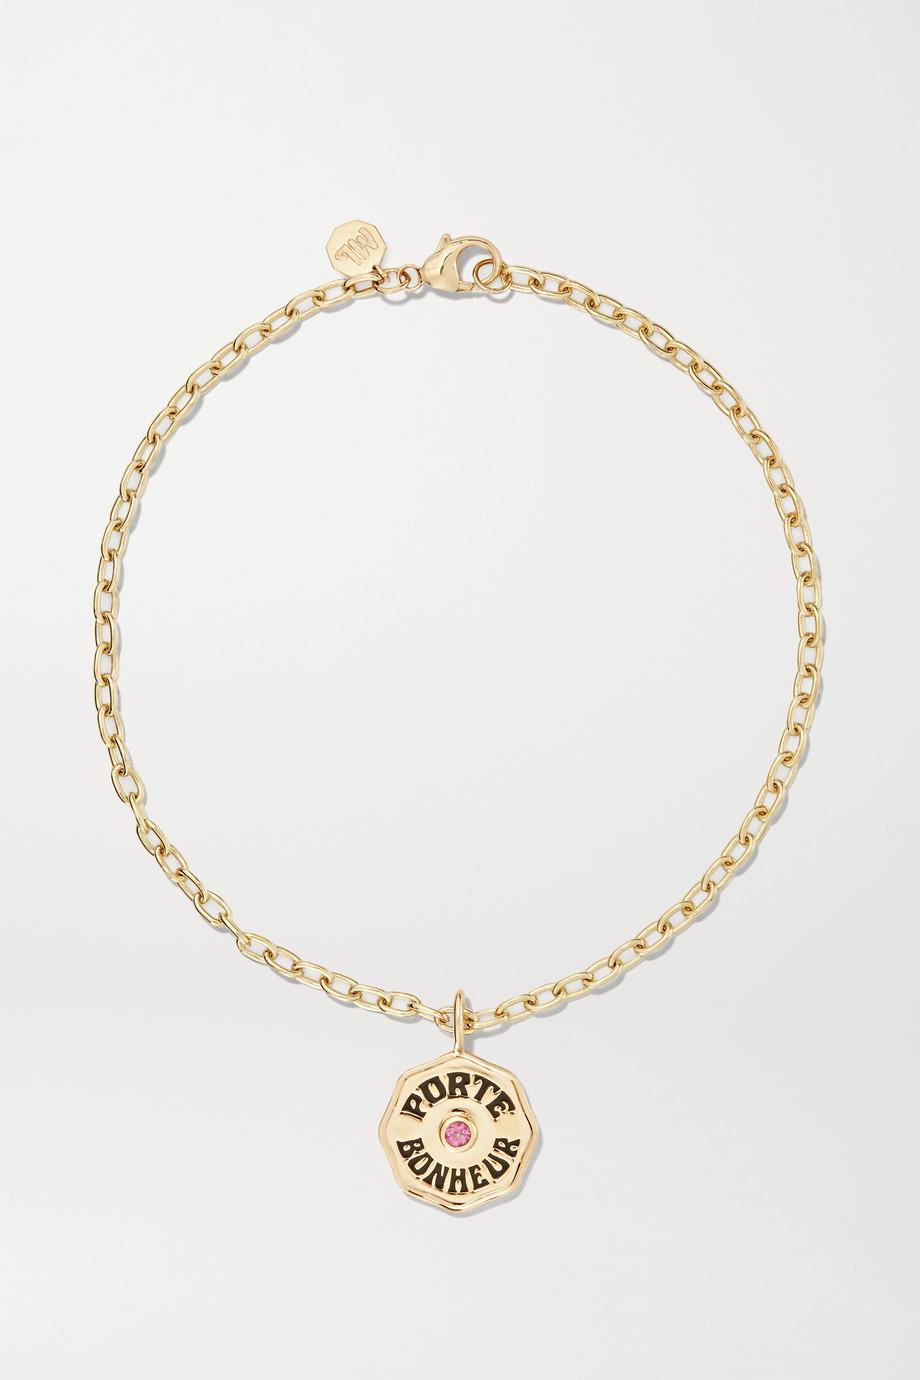 Marlo Laz Mini Porte Bonheur Coin 14-karat gold, enamel and sapphire anklet